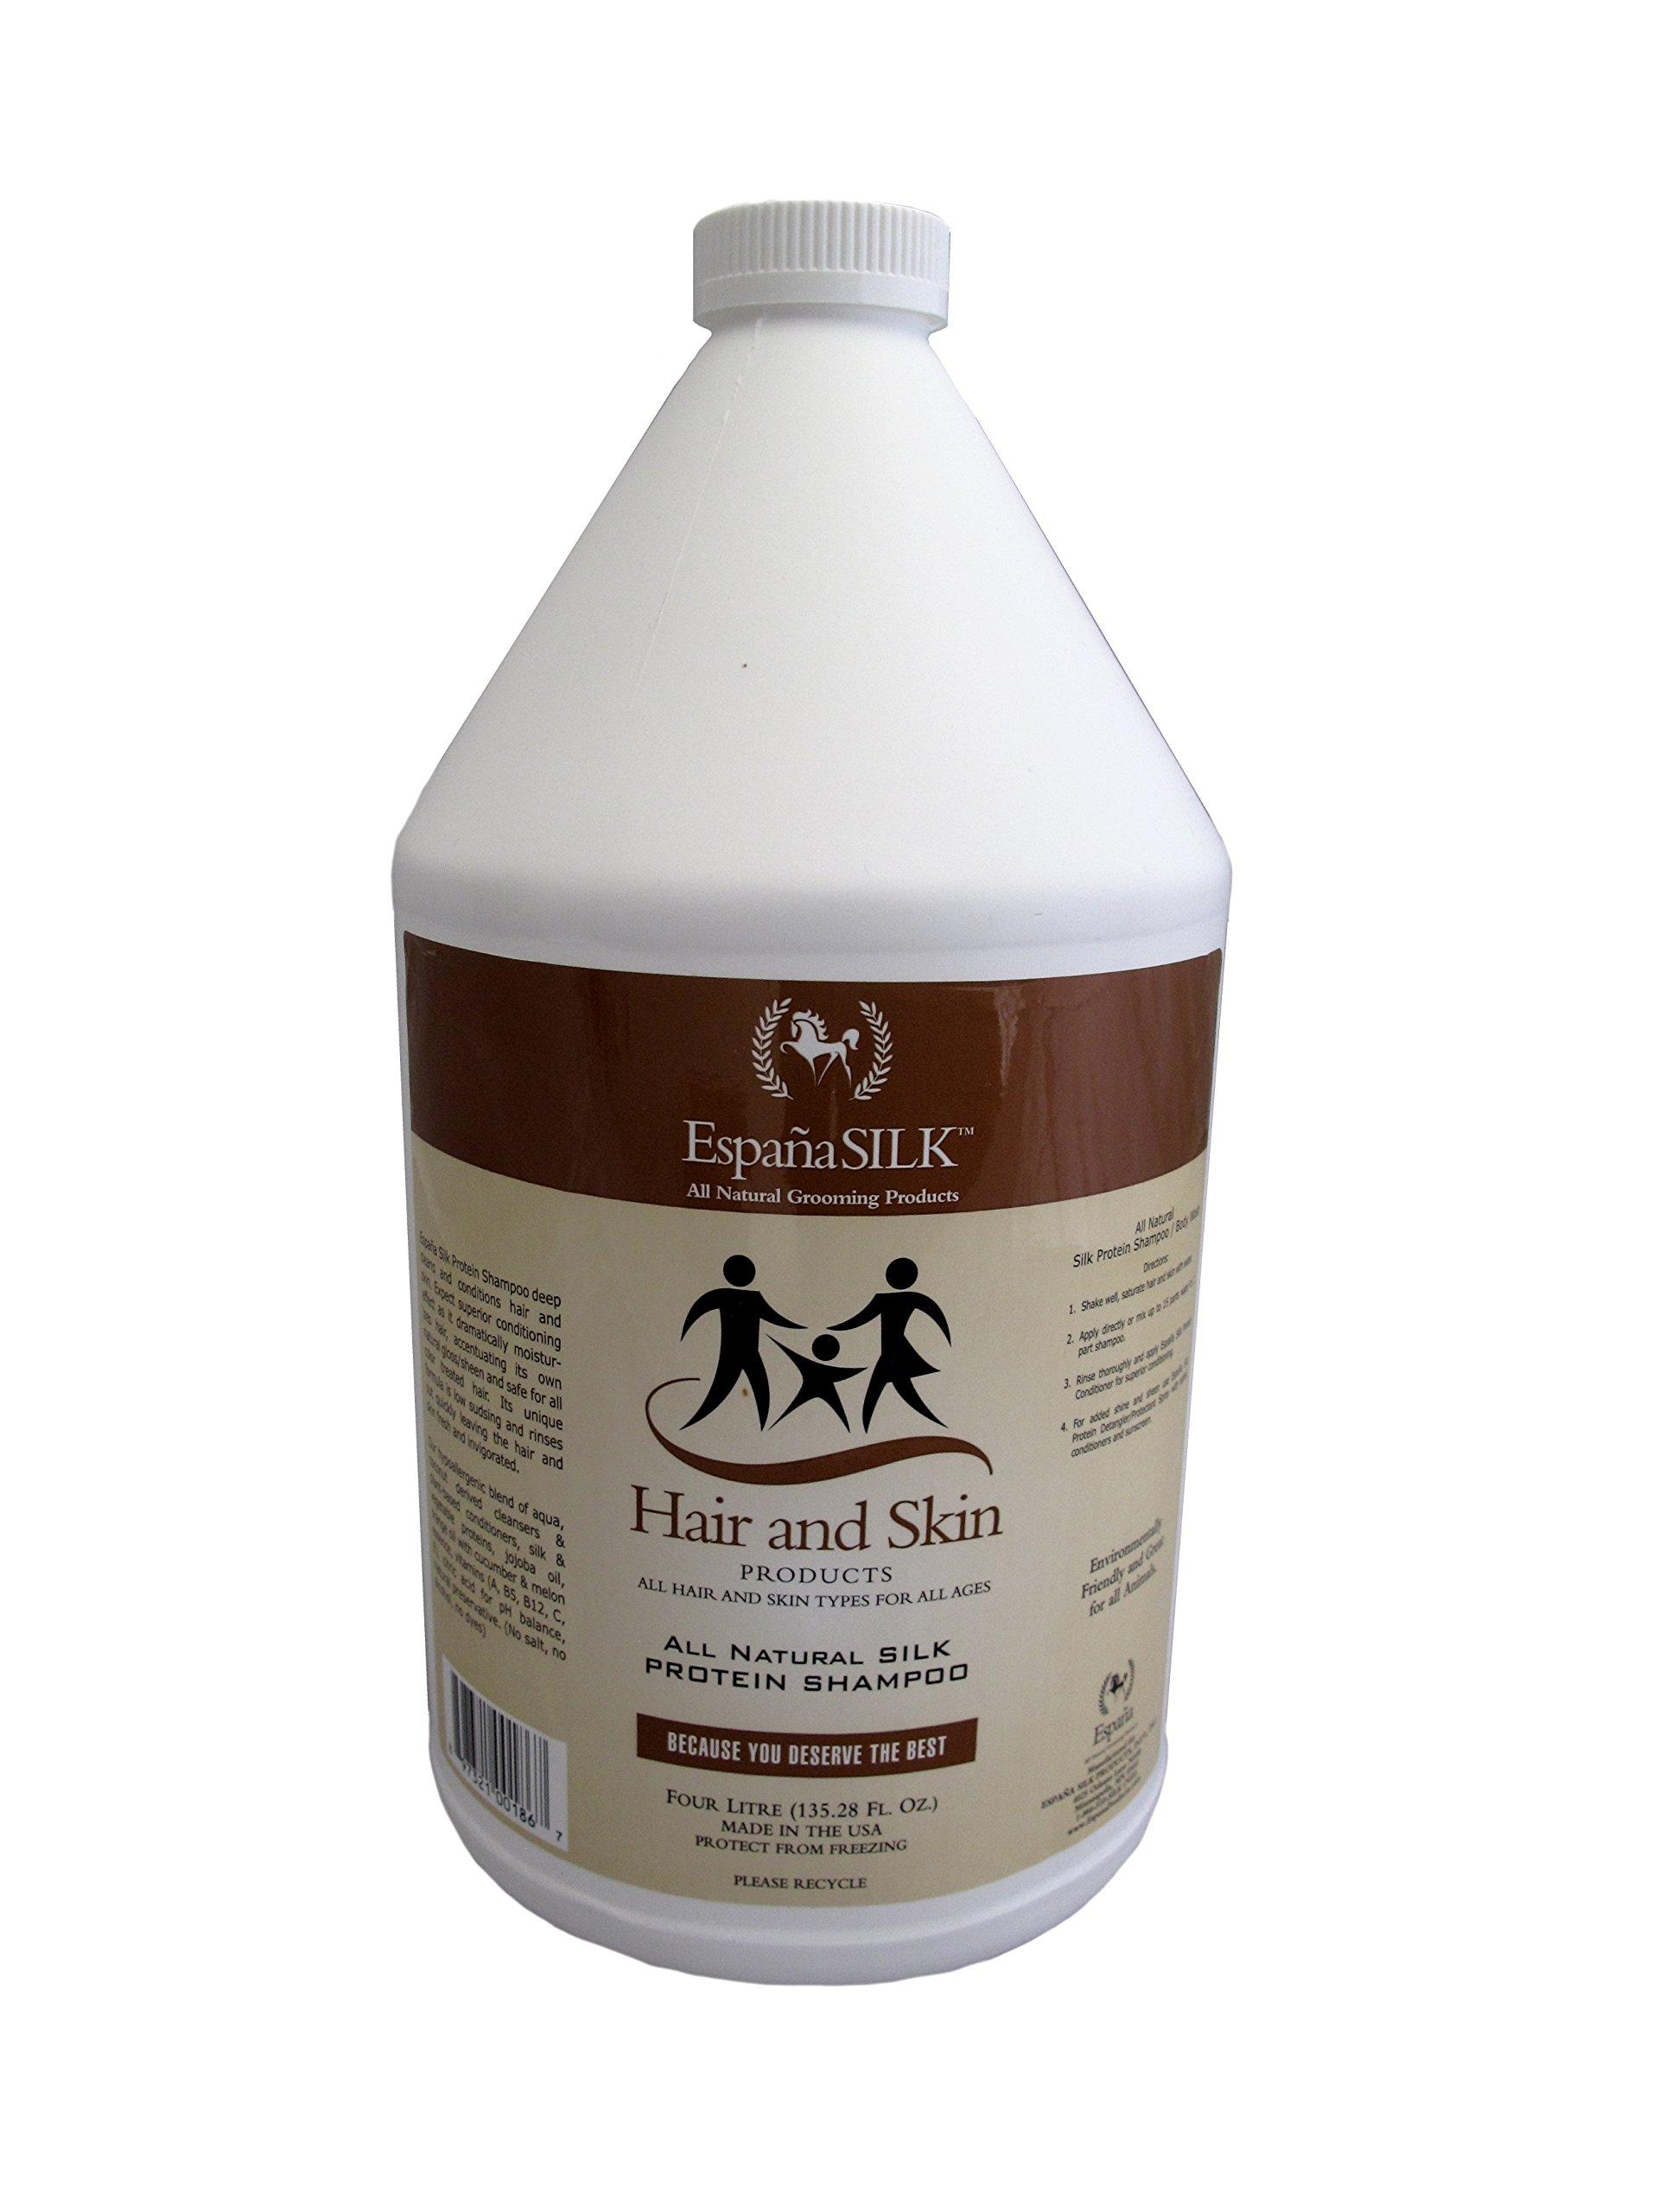 Espana Silk ESP0025P 135.28 oz Protein Shampoo, 4 L by EspanaSILK